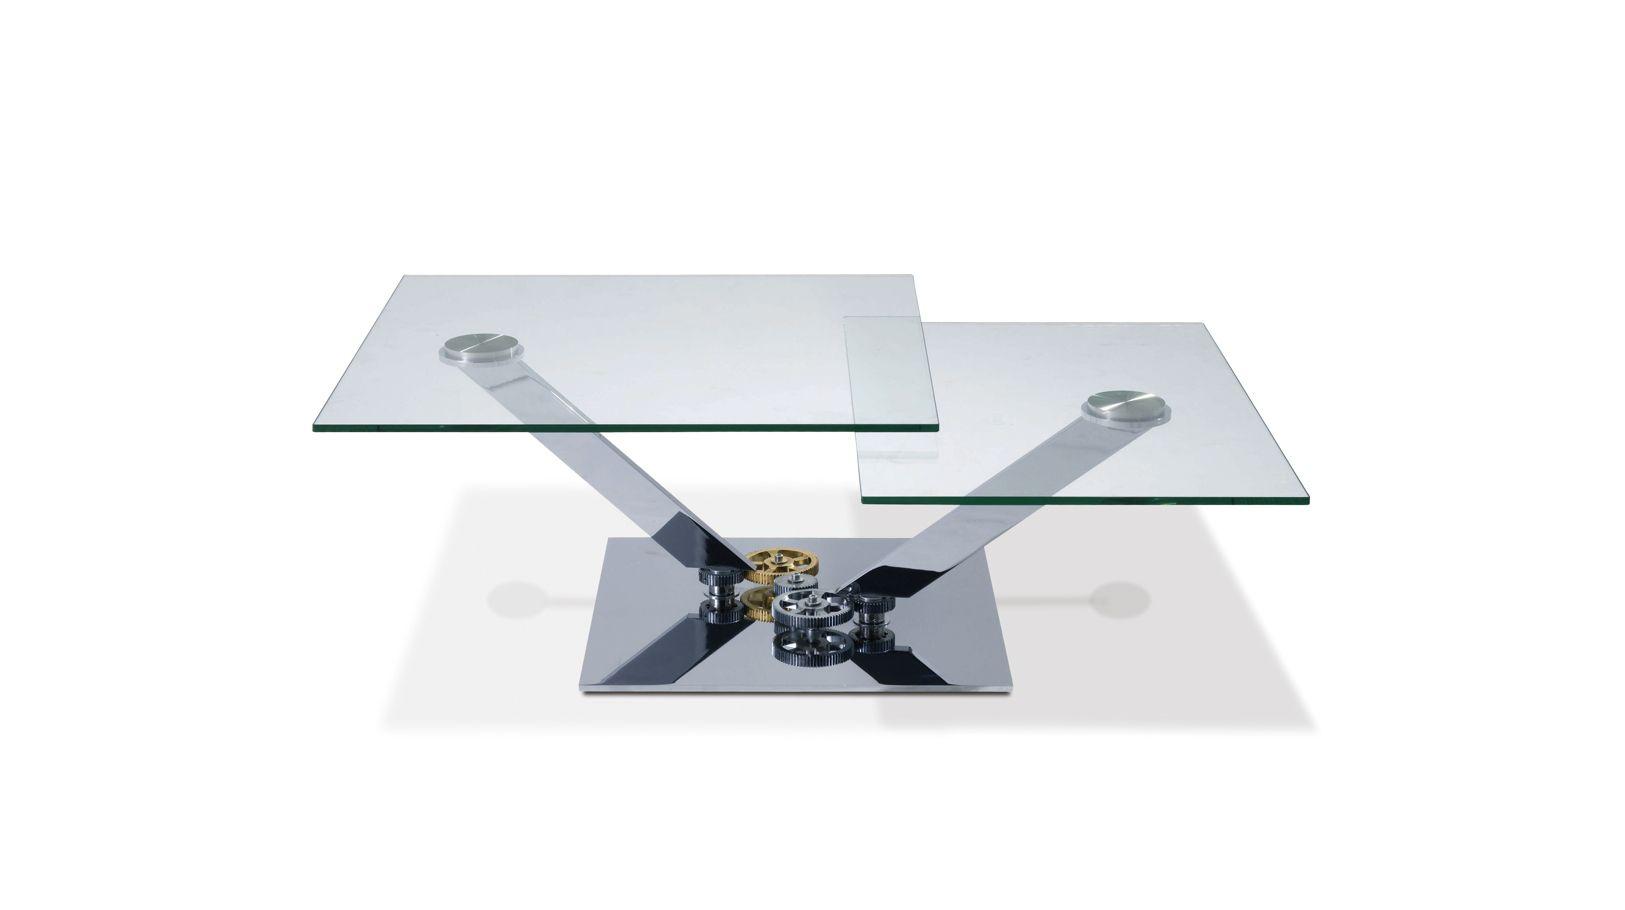 astrolab table de repas roche bobois. Black Bedroom Furniture Sets. Home Design Ideas